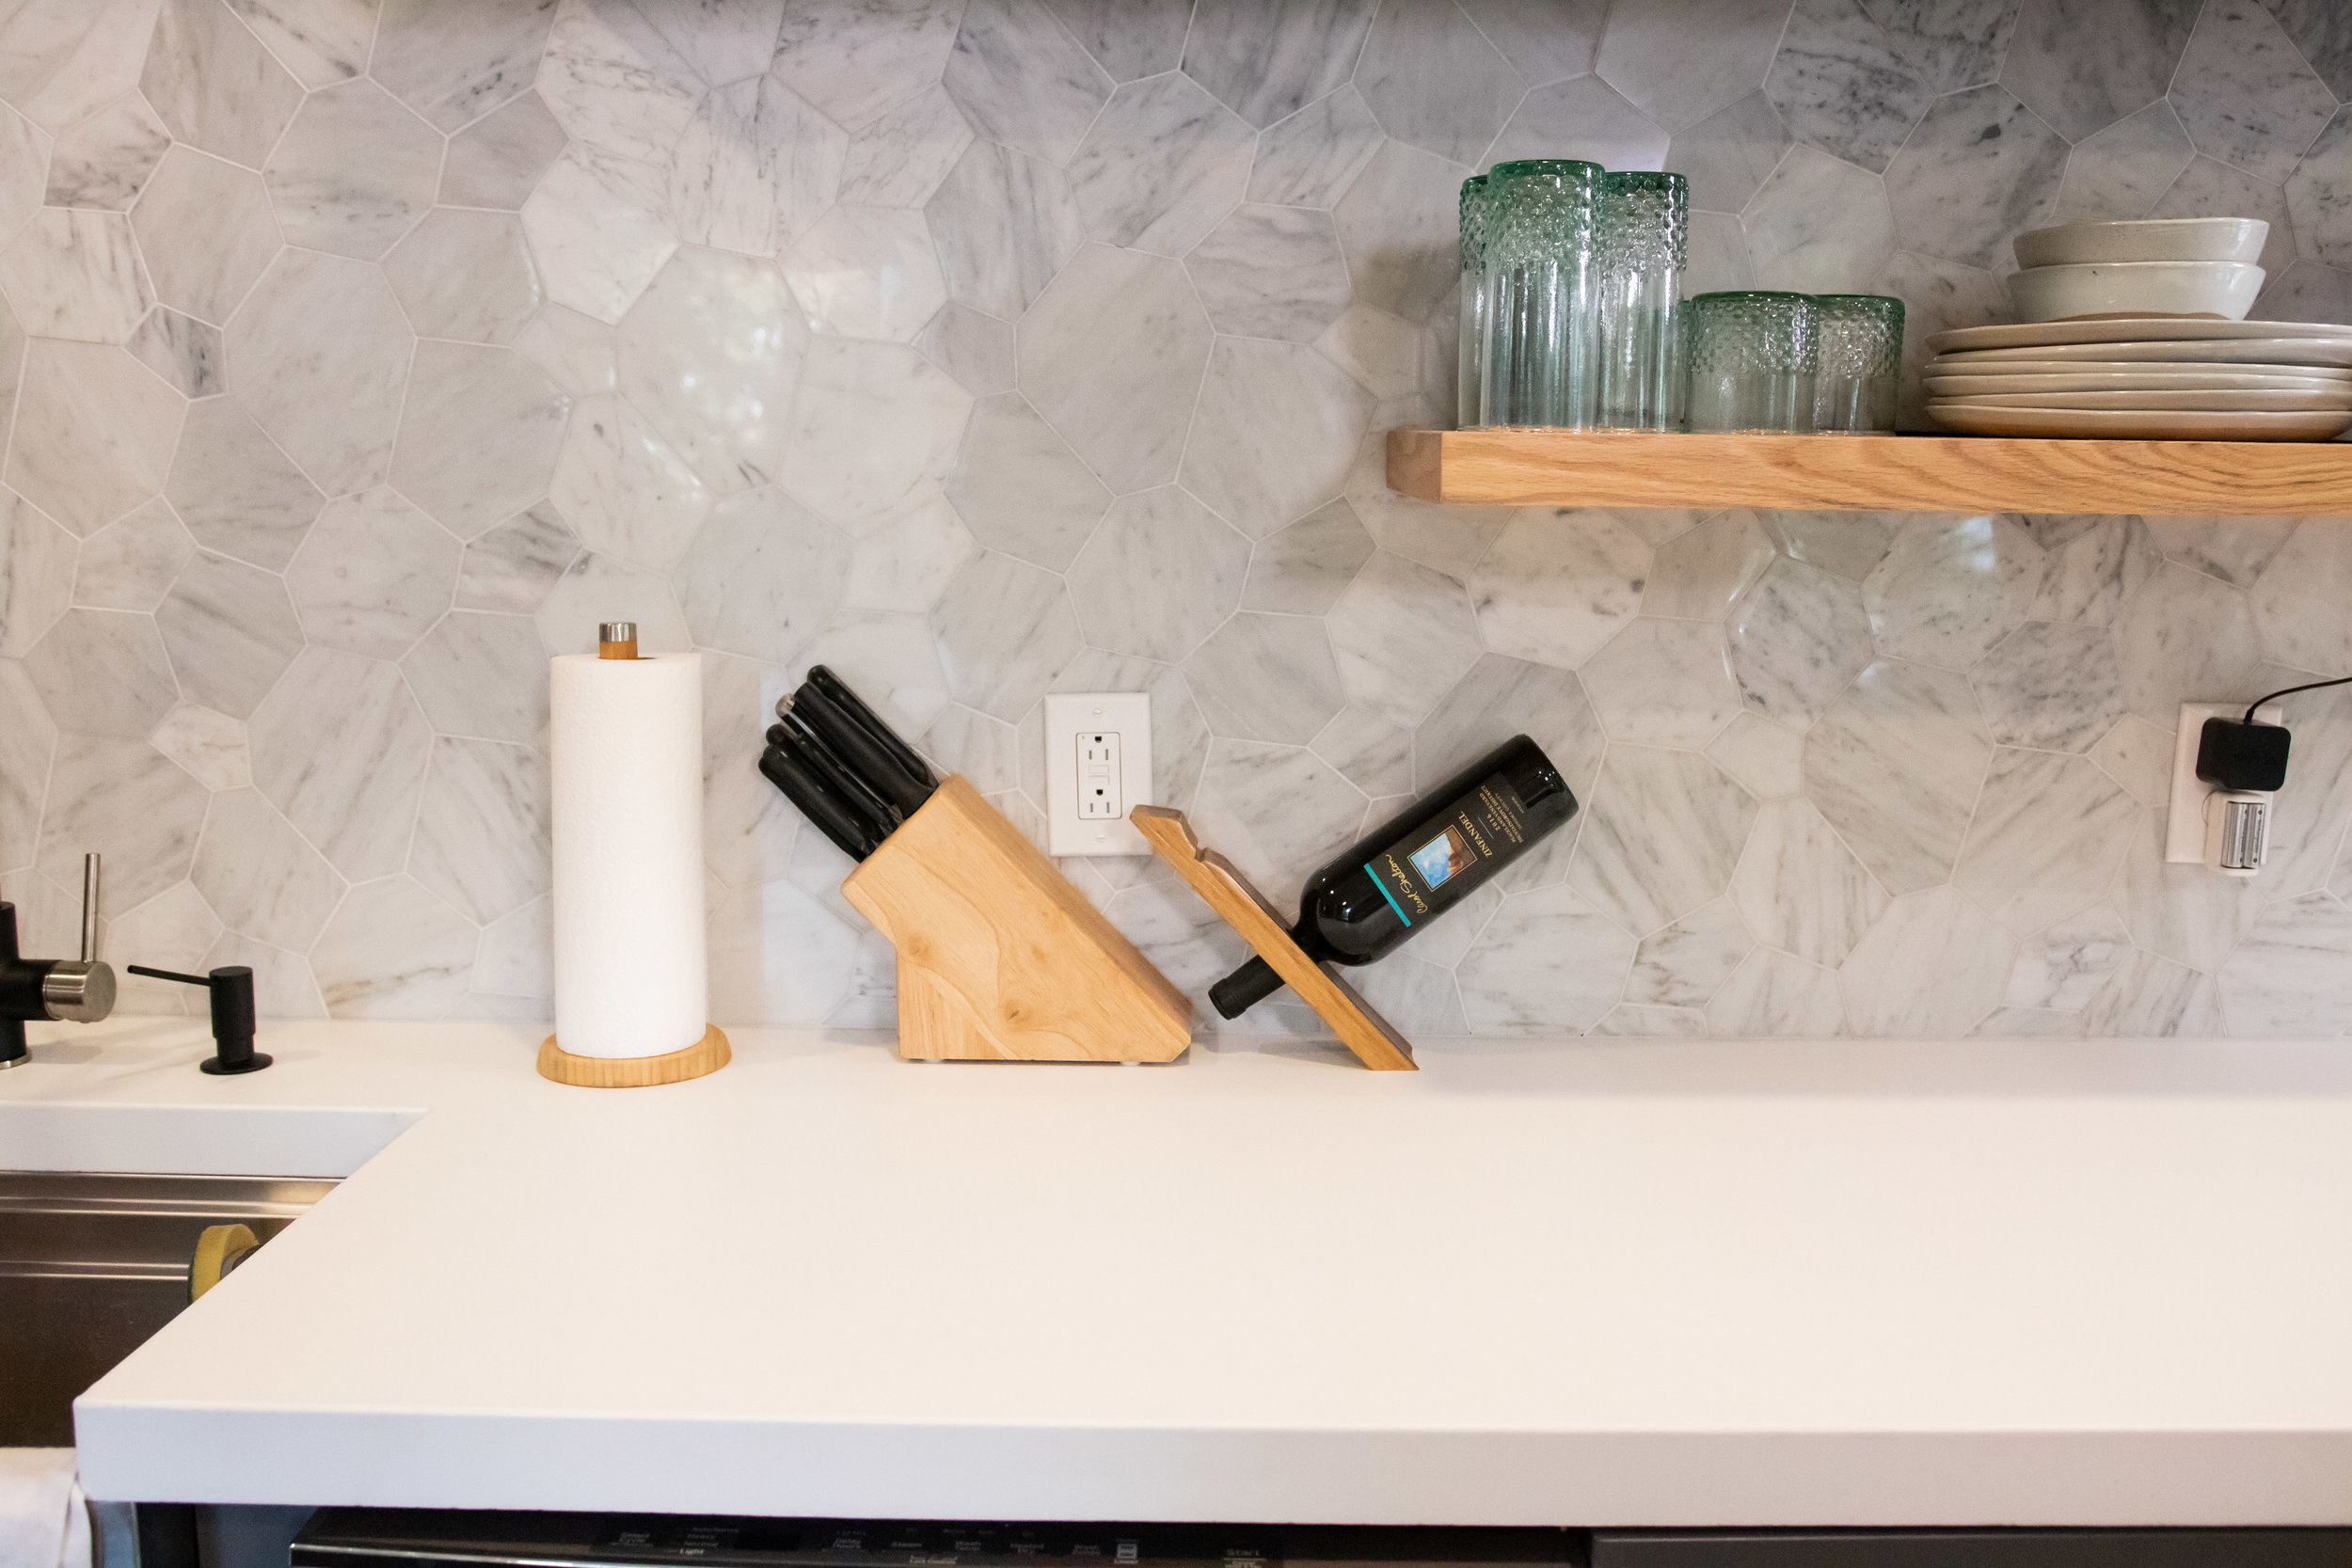 5300-countertop-kitchen-10.jpg